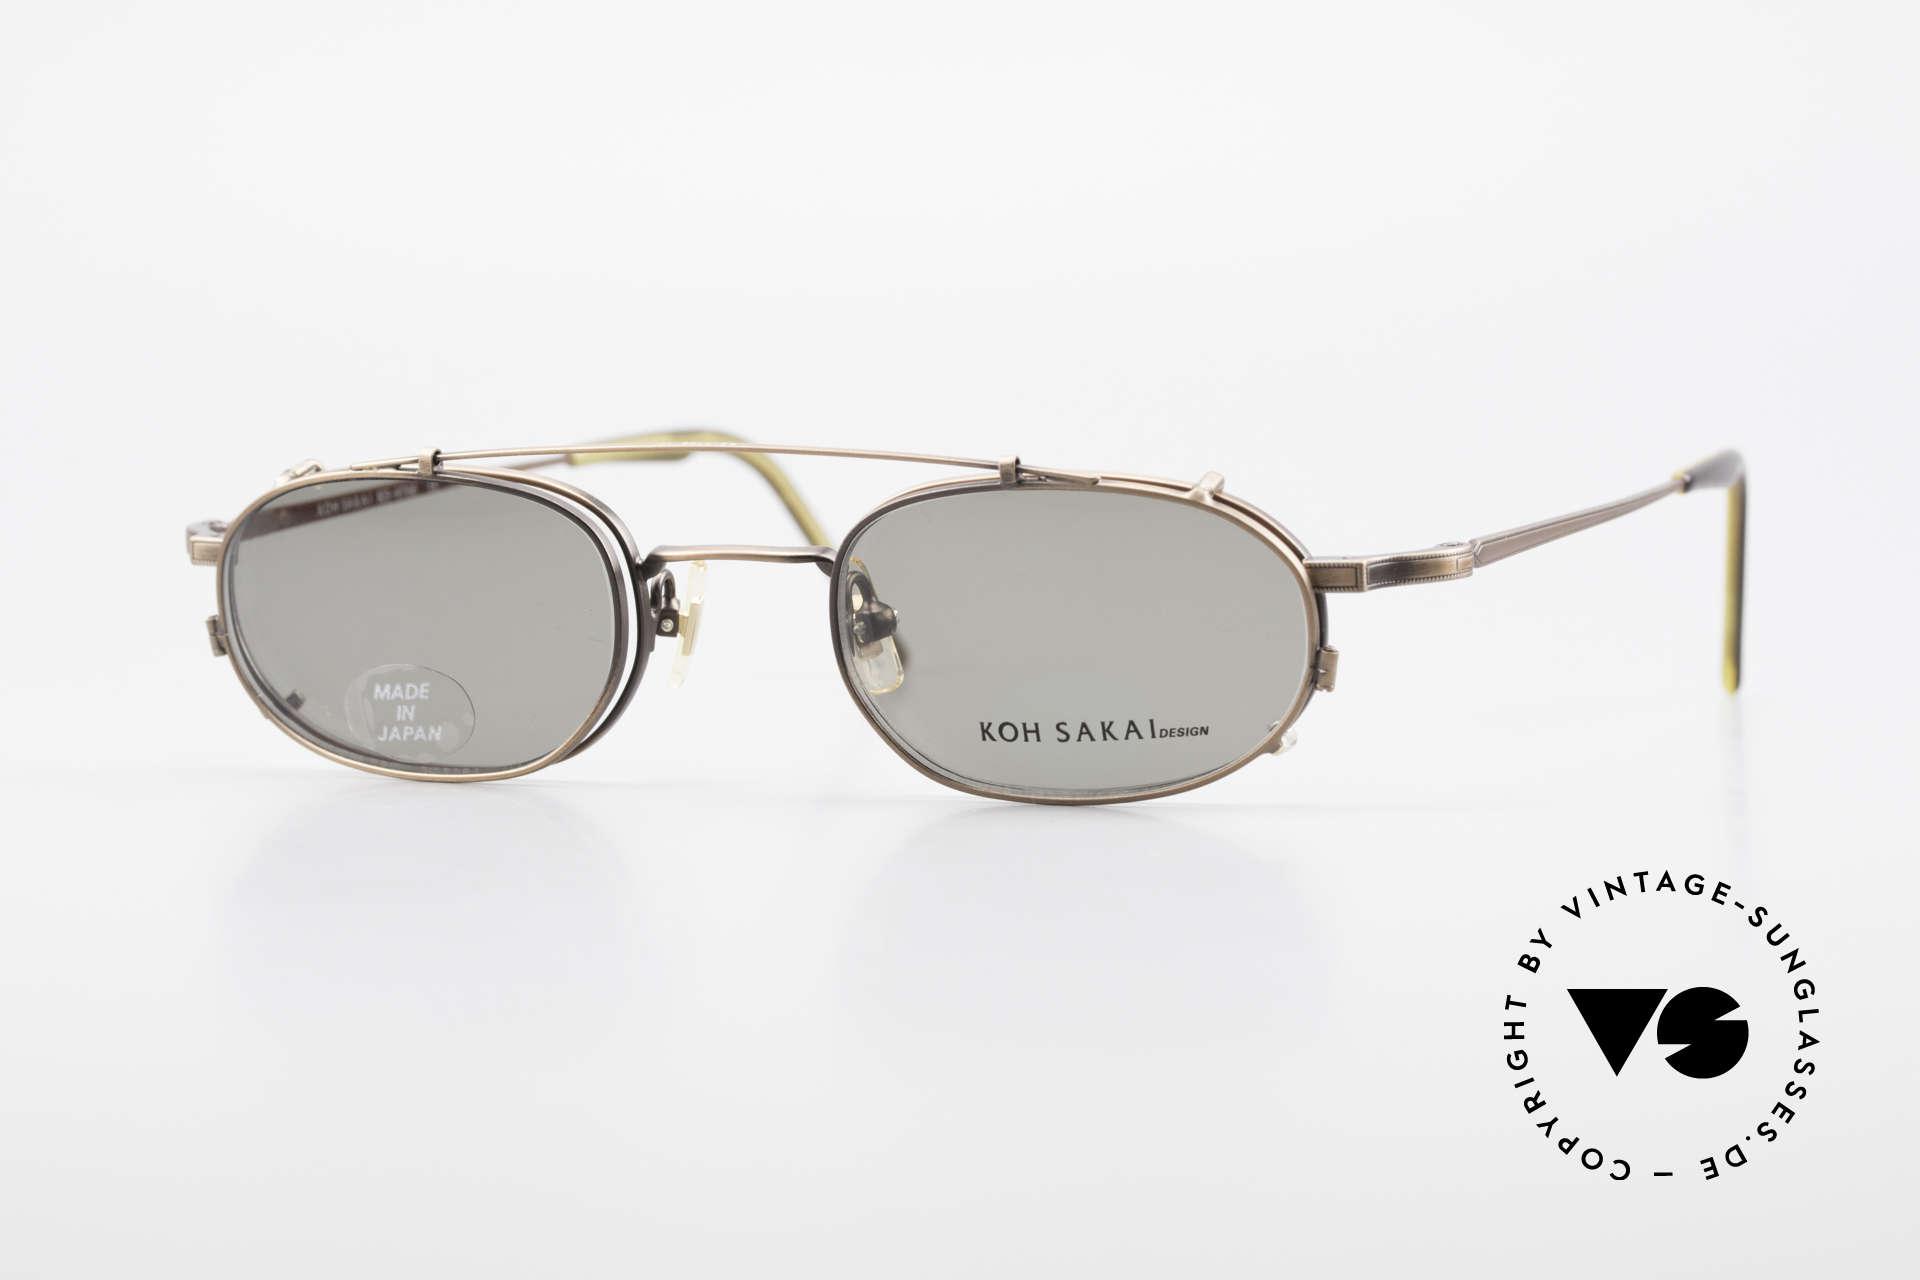 Koh Sakai KS9706 Original Made in Japan Frame, rare, vintage Koh Sakai glasses with clip-on from 1997, Made for Men and Women